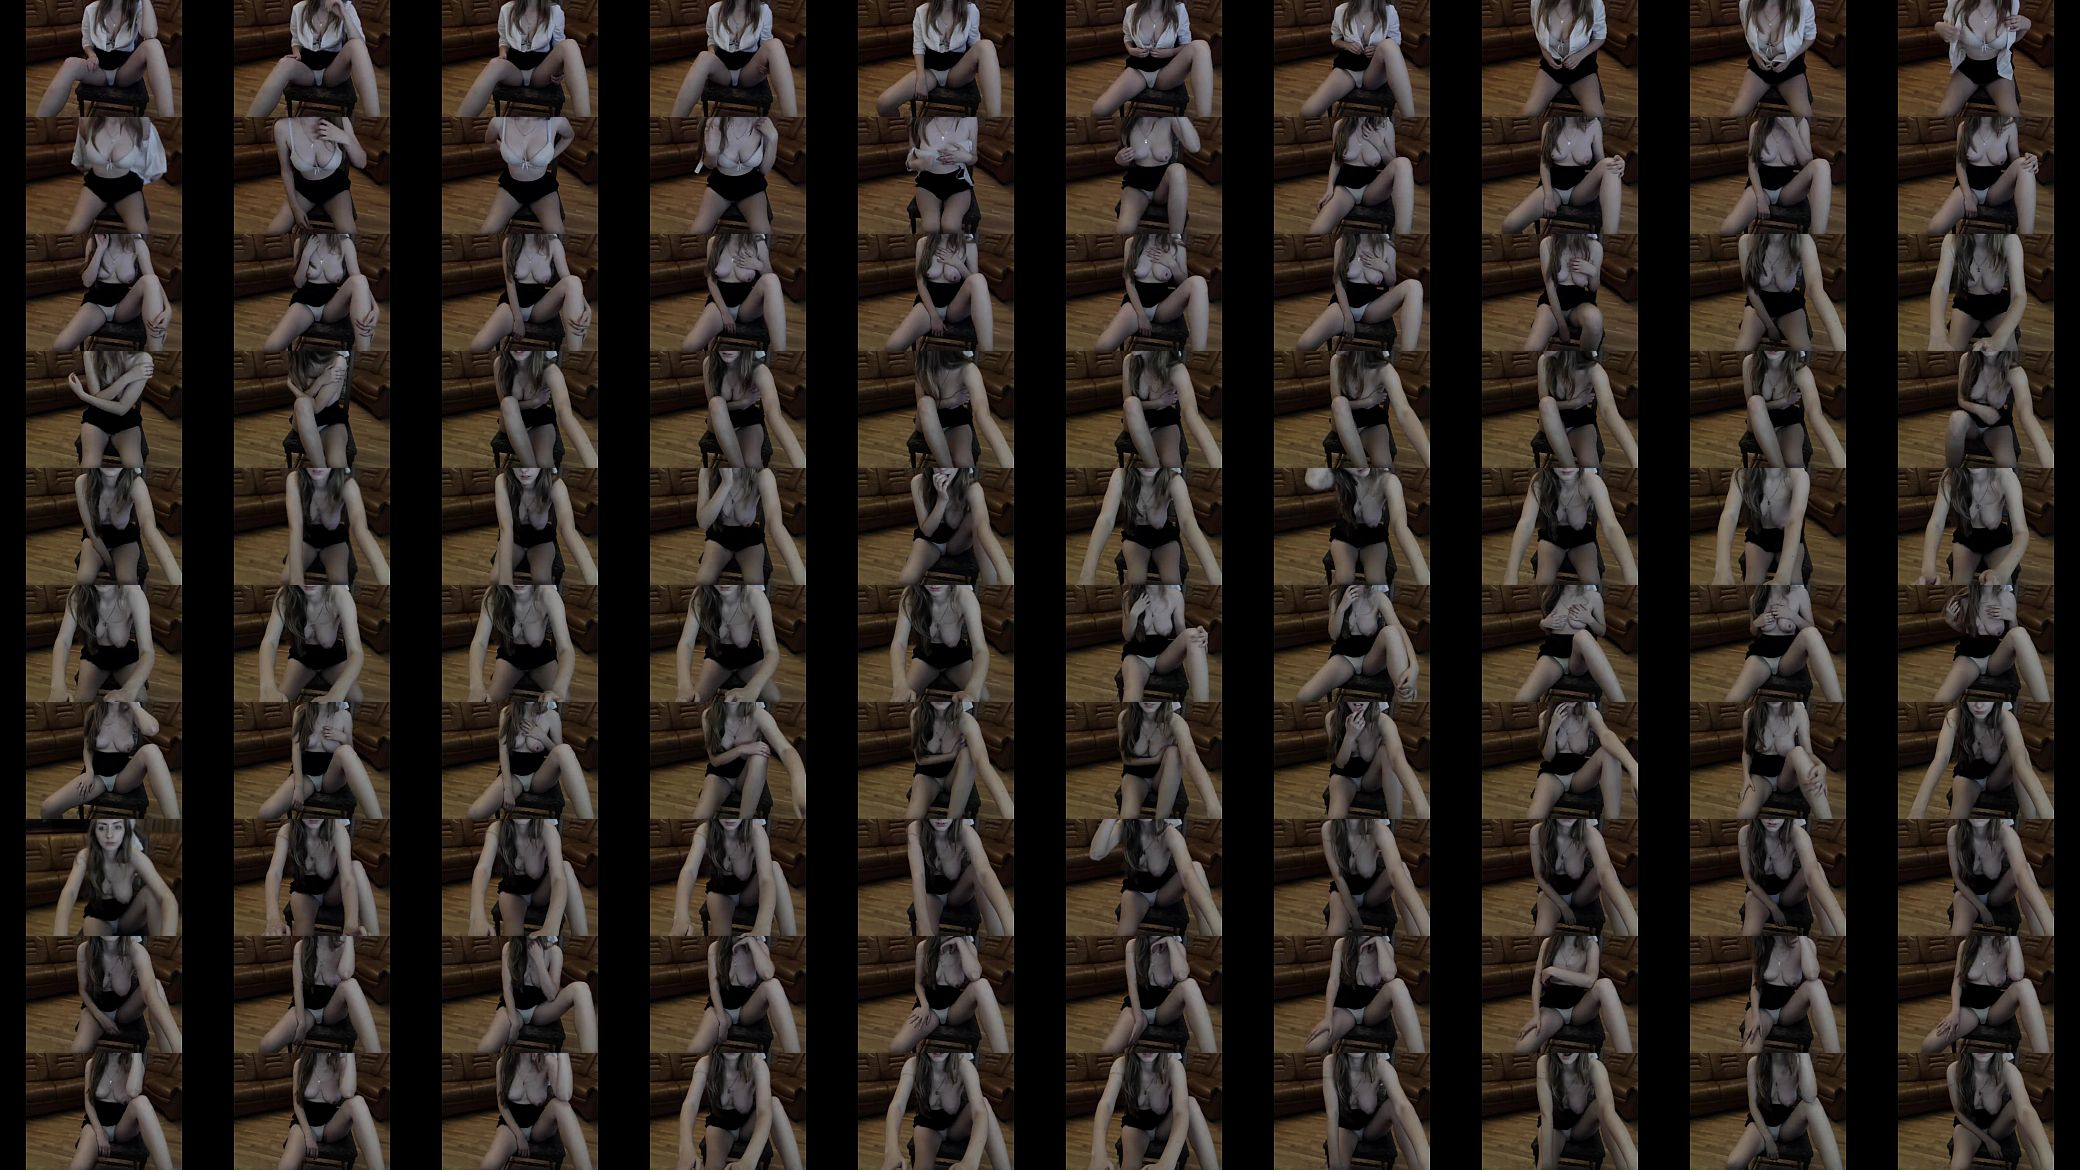 Awesomegirl38 Porn 40829 (1) - xnxx